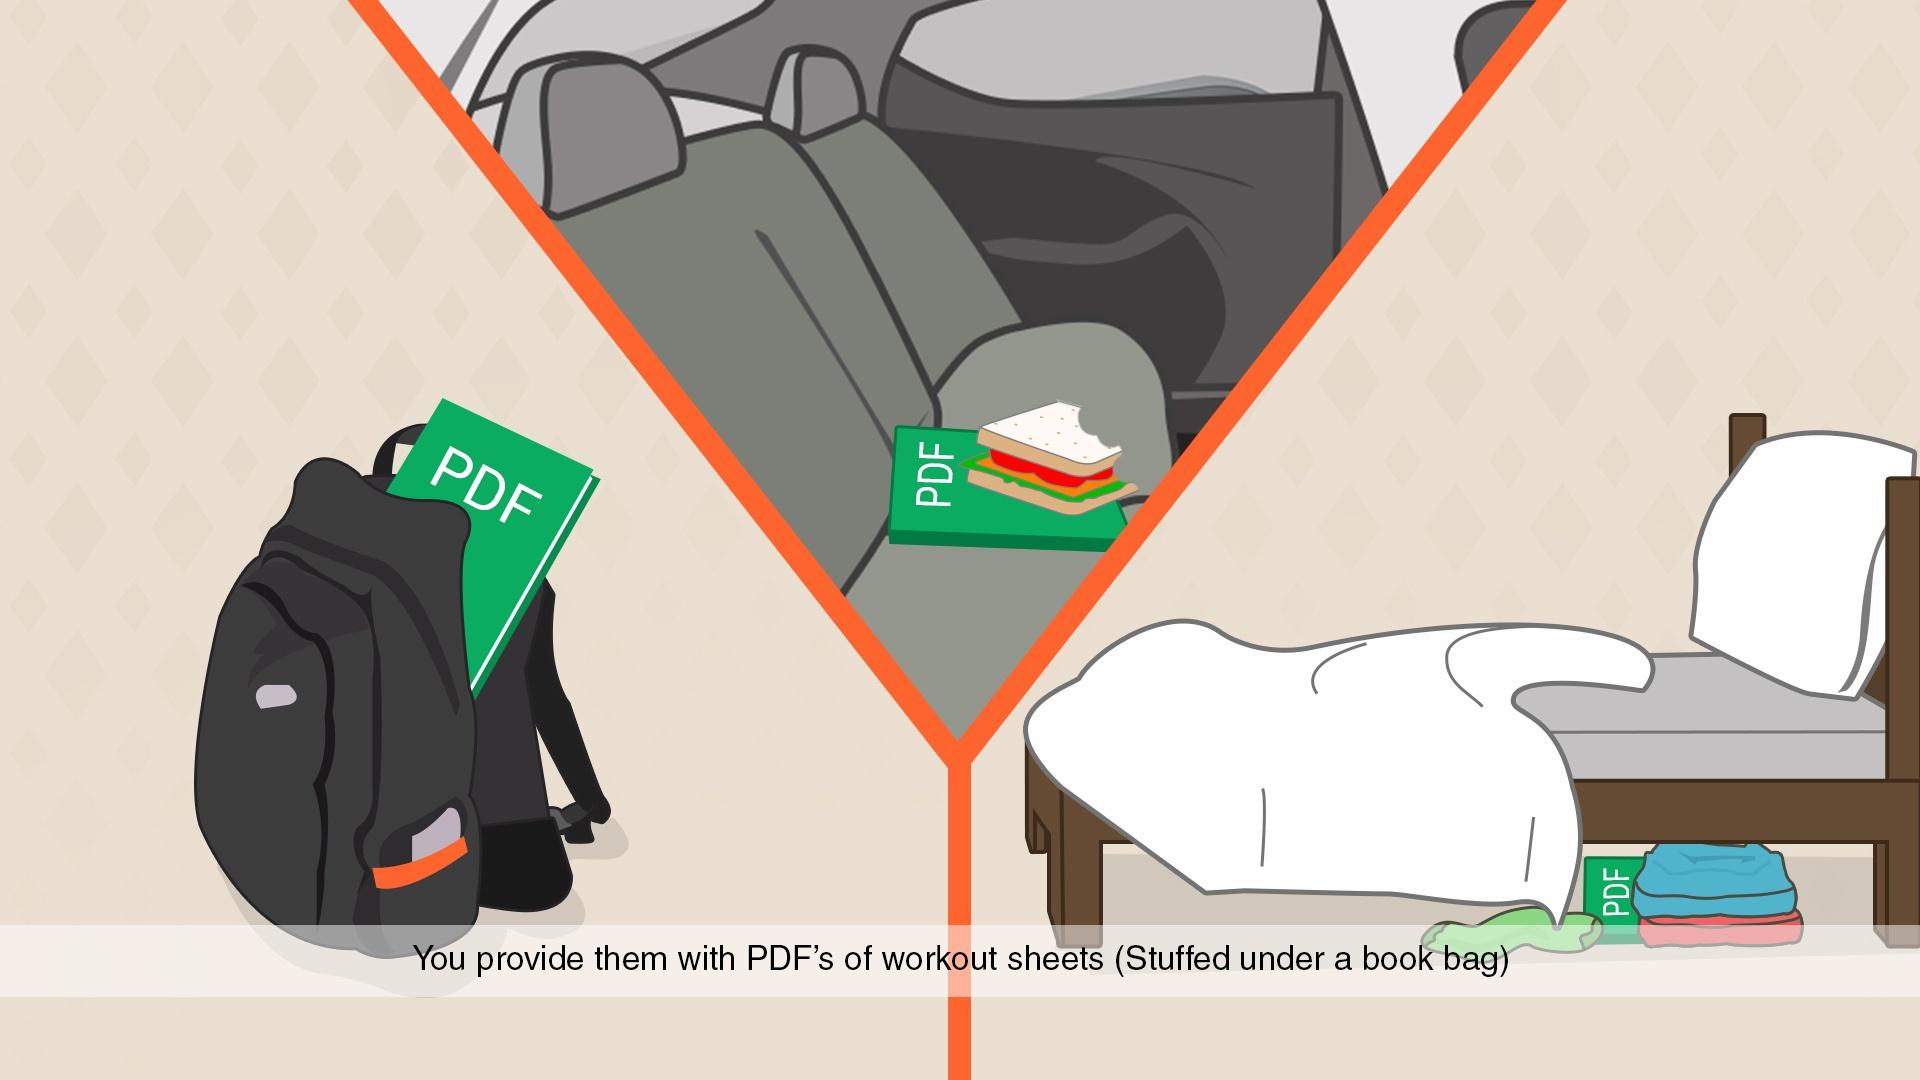 Video 3 - PDF's Stuffed under a bookbag